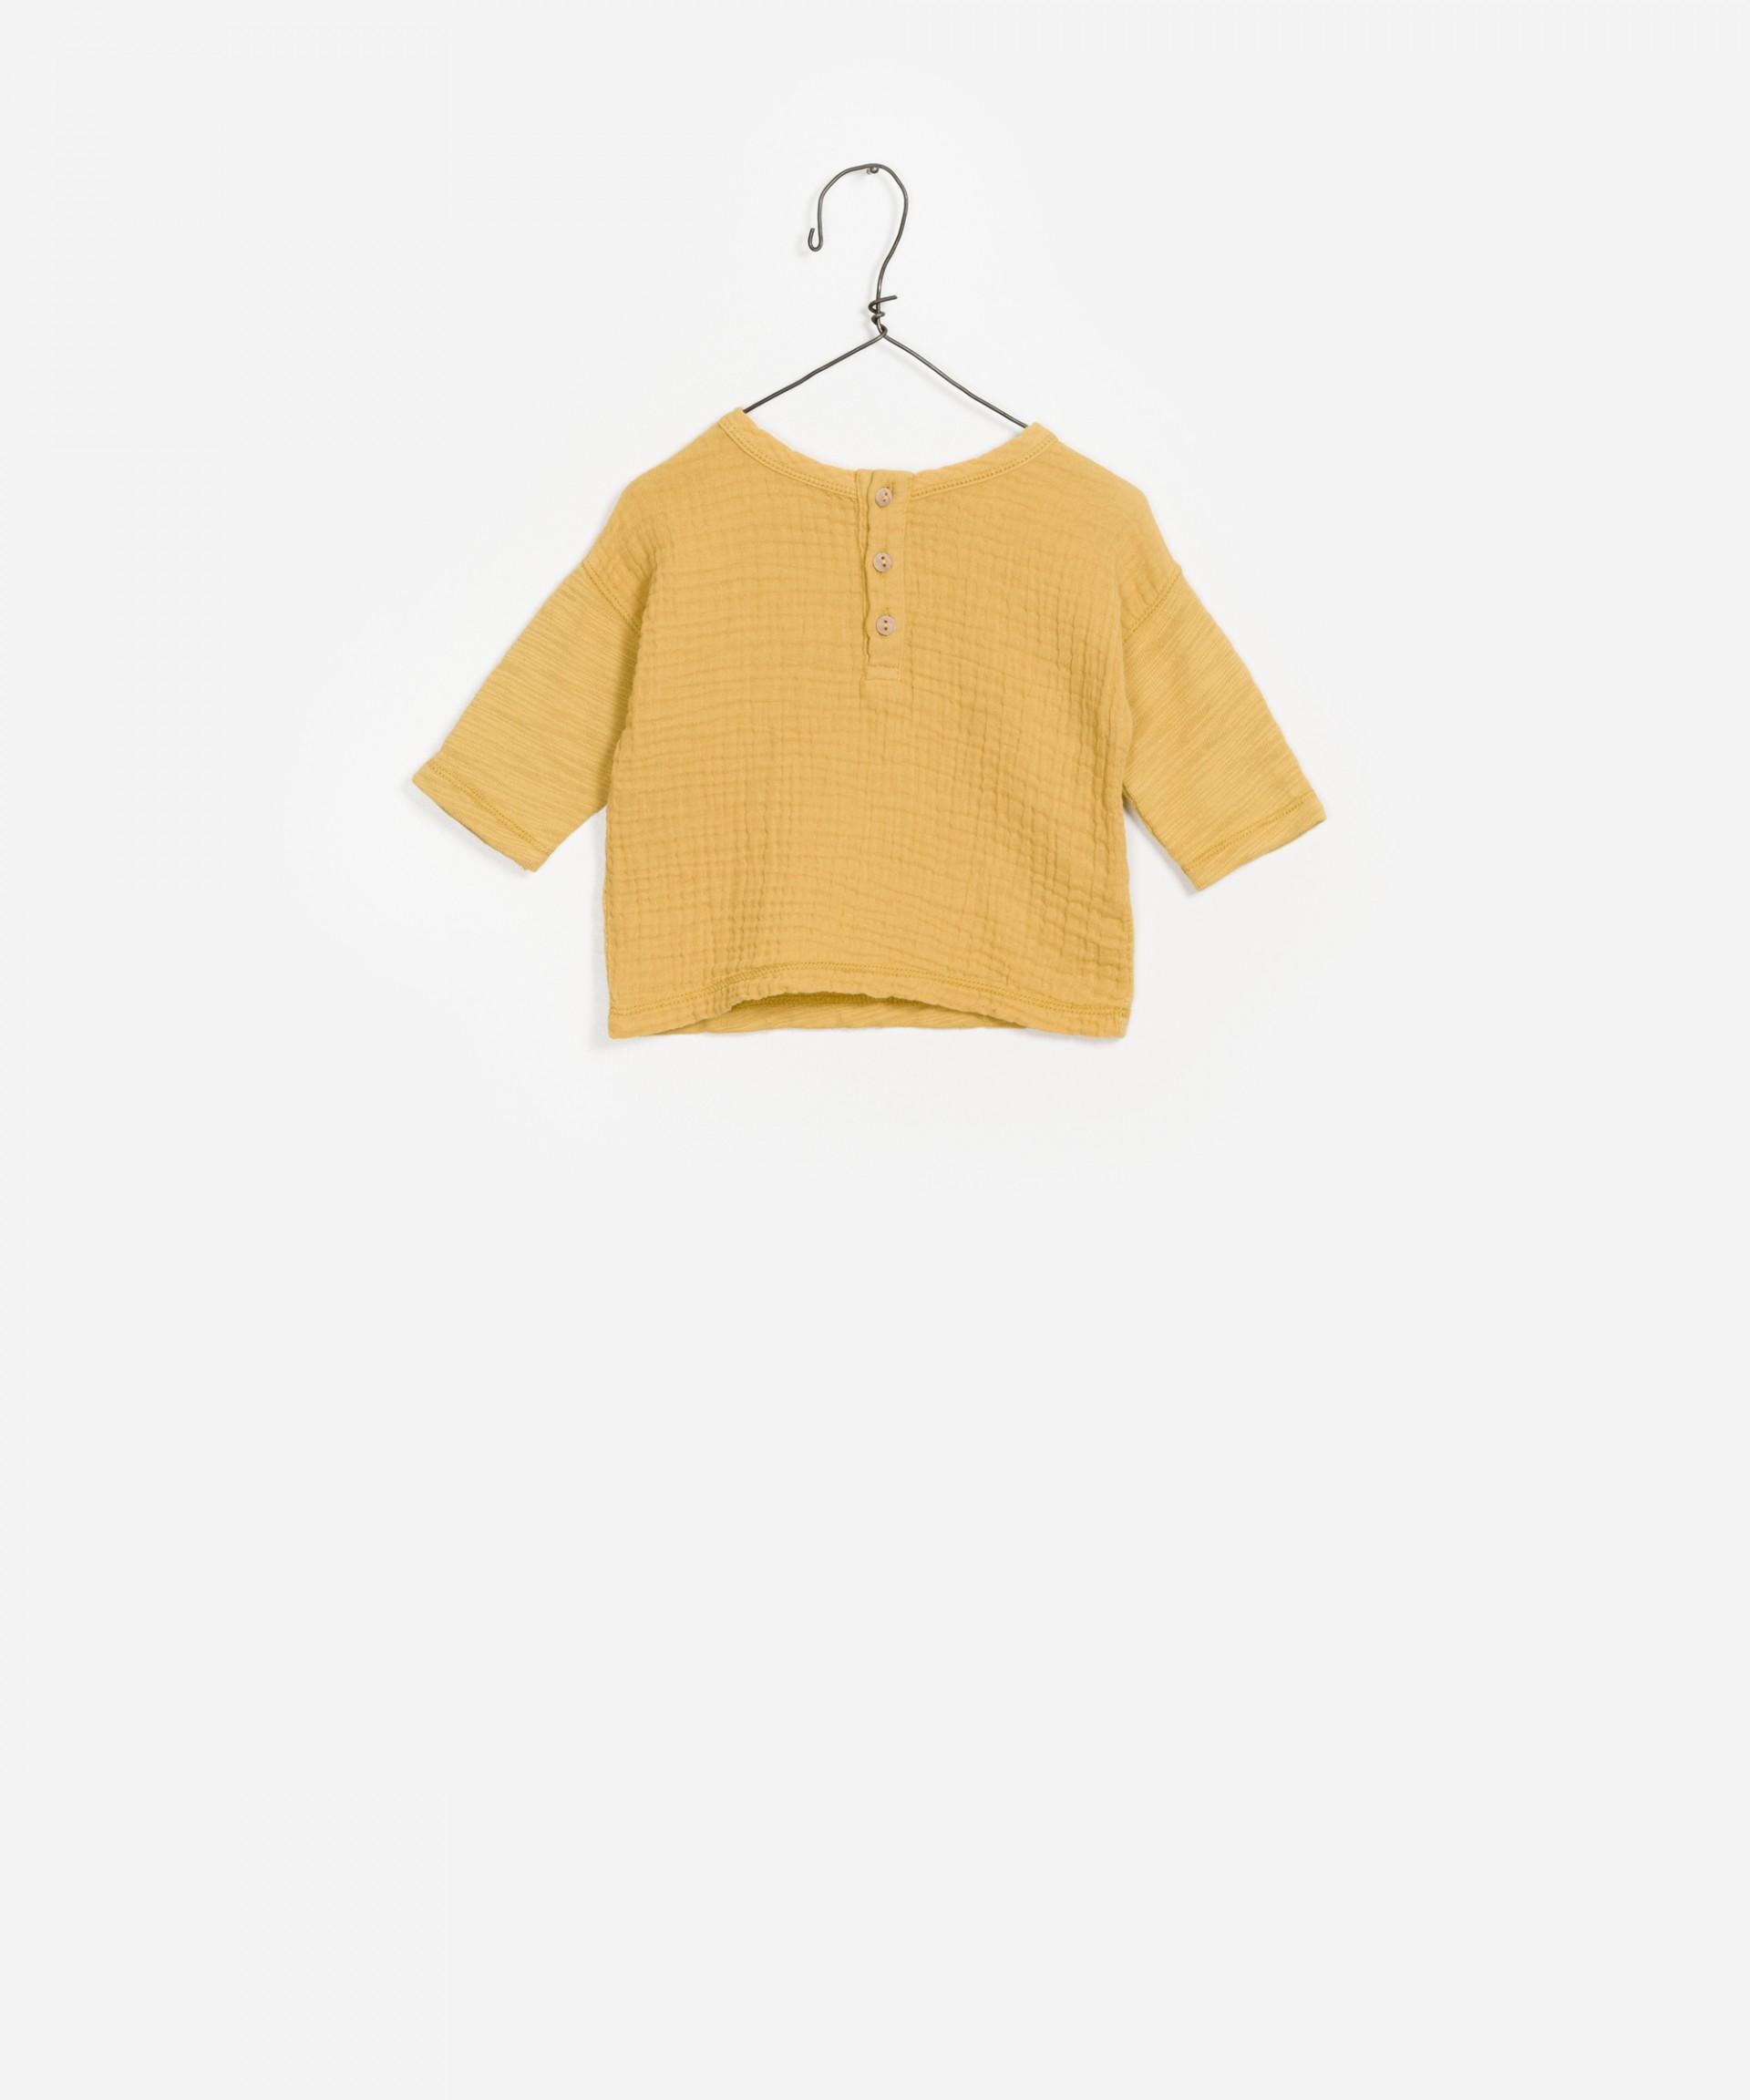 Baby shirt, 100% cotton